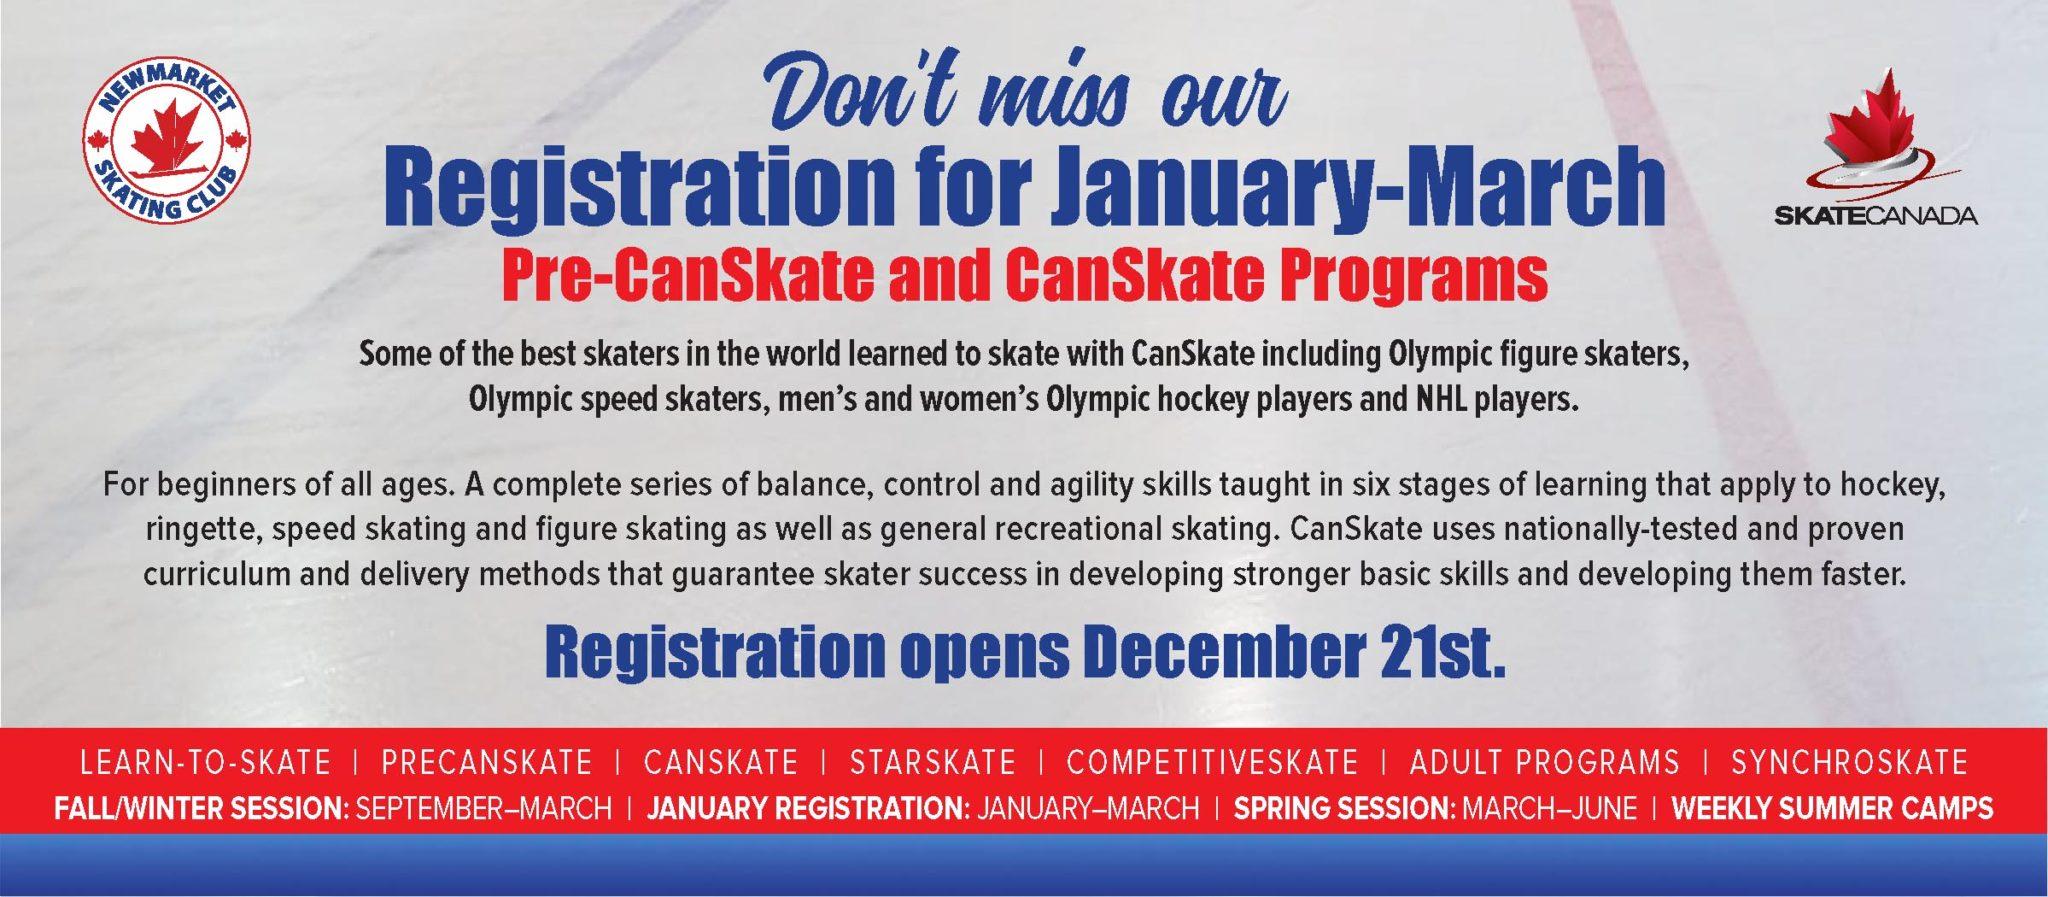 January Canskate Registration